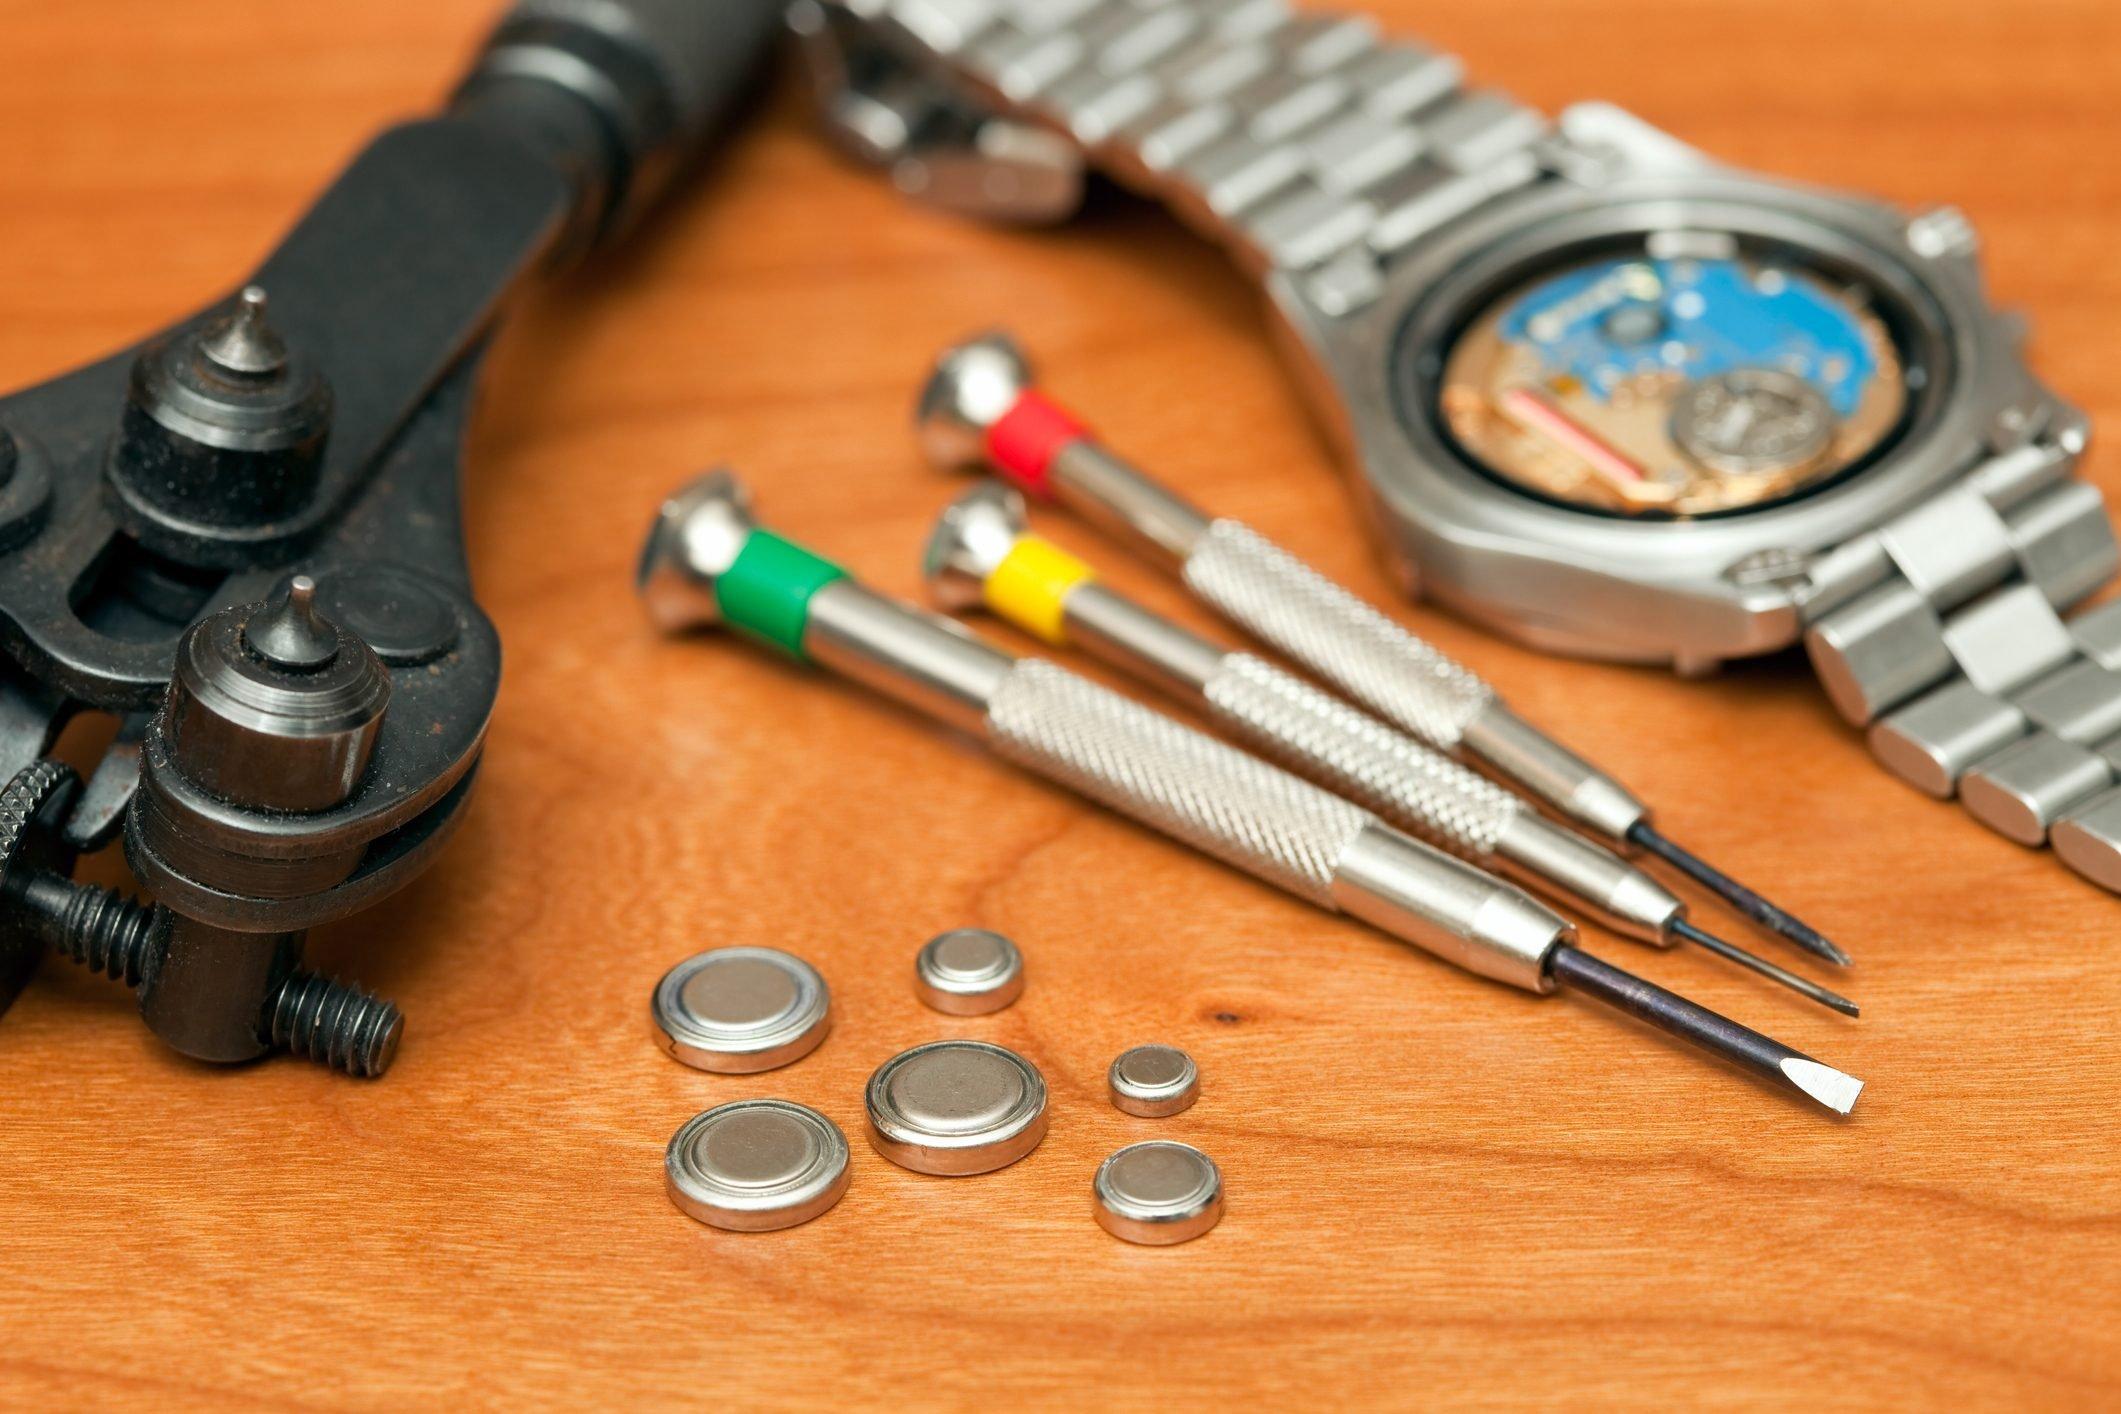 Watch Repair, Battery Replacement